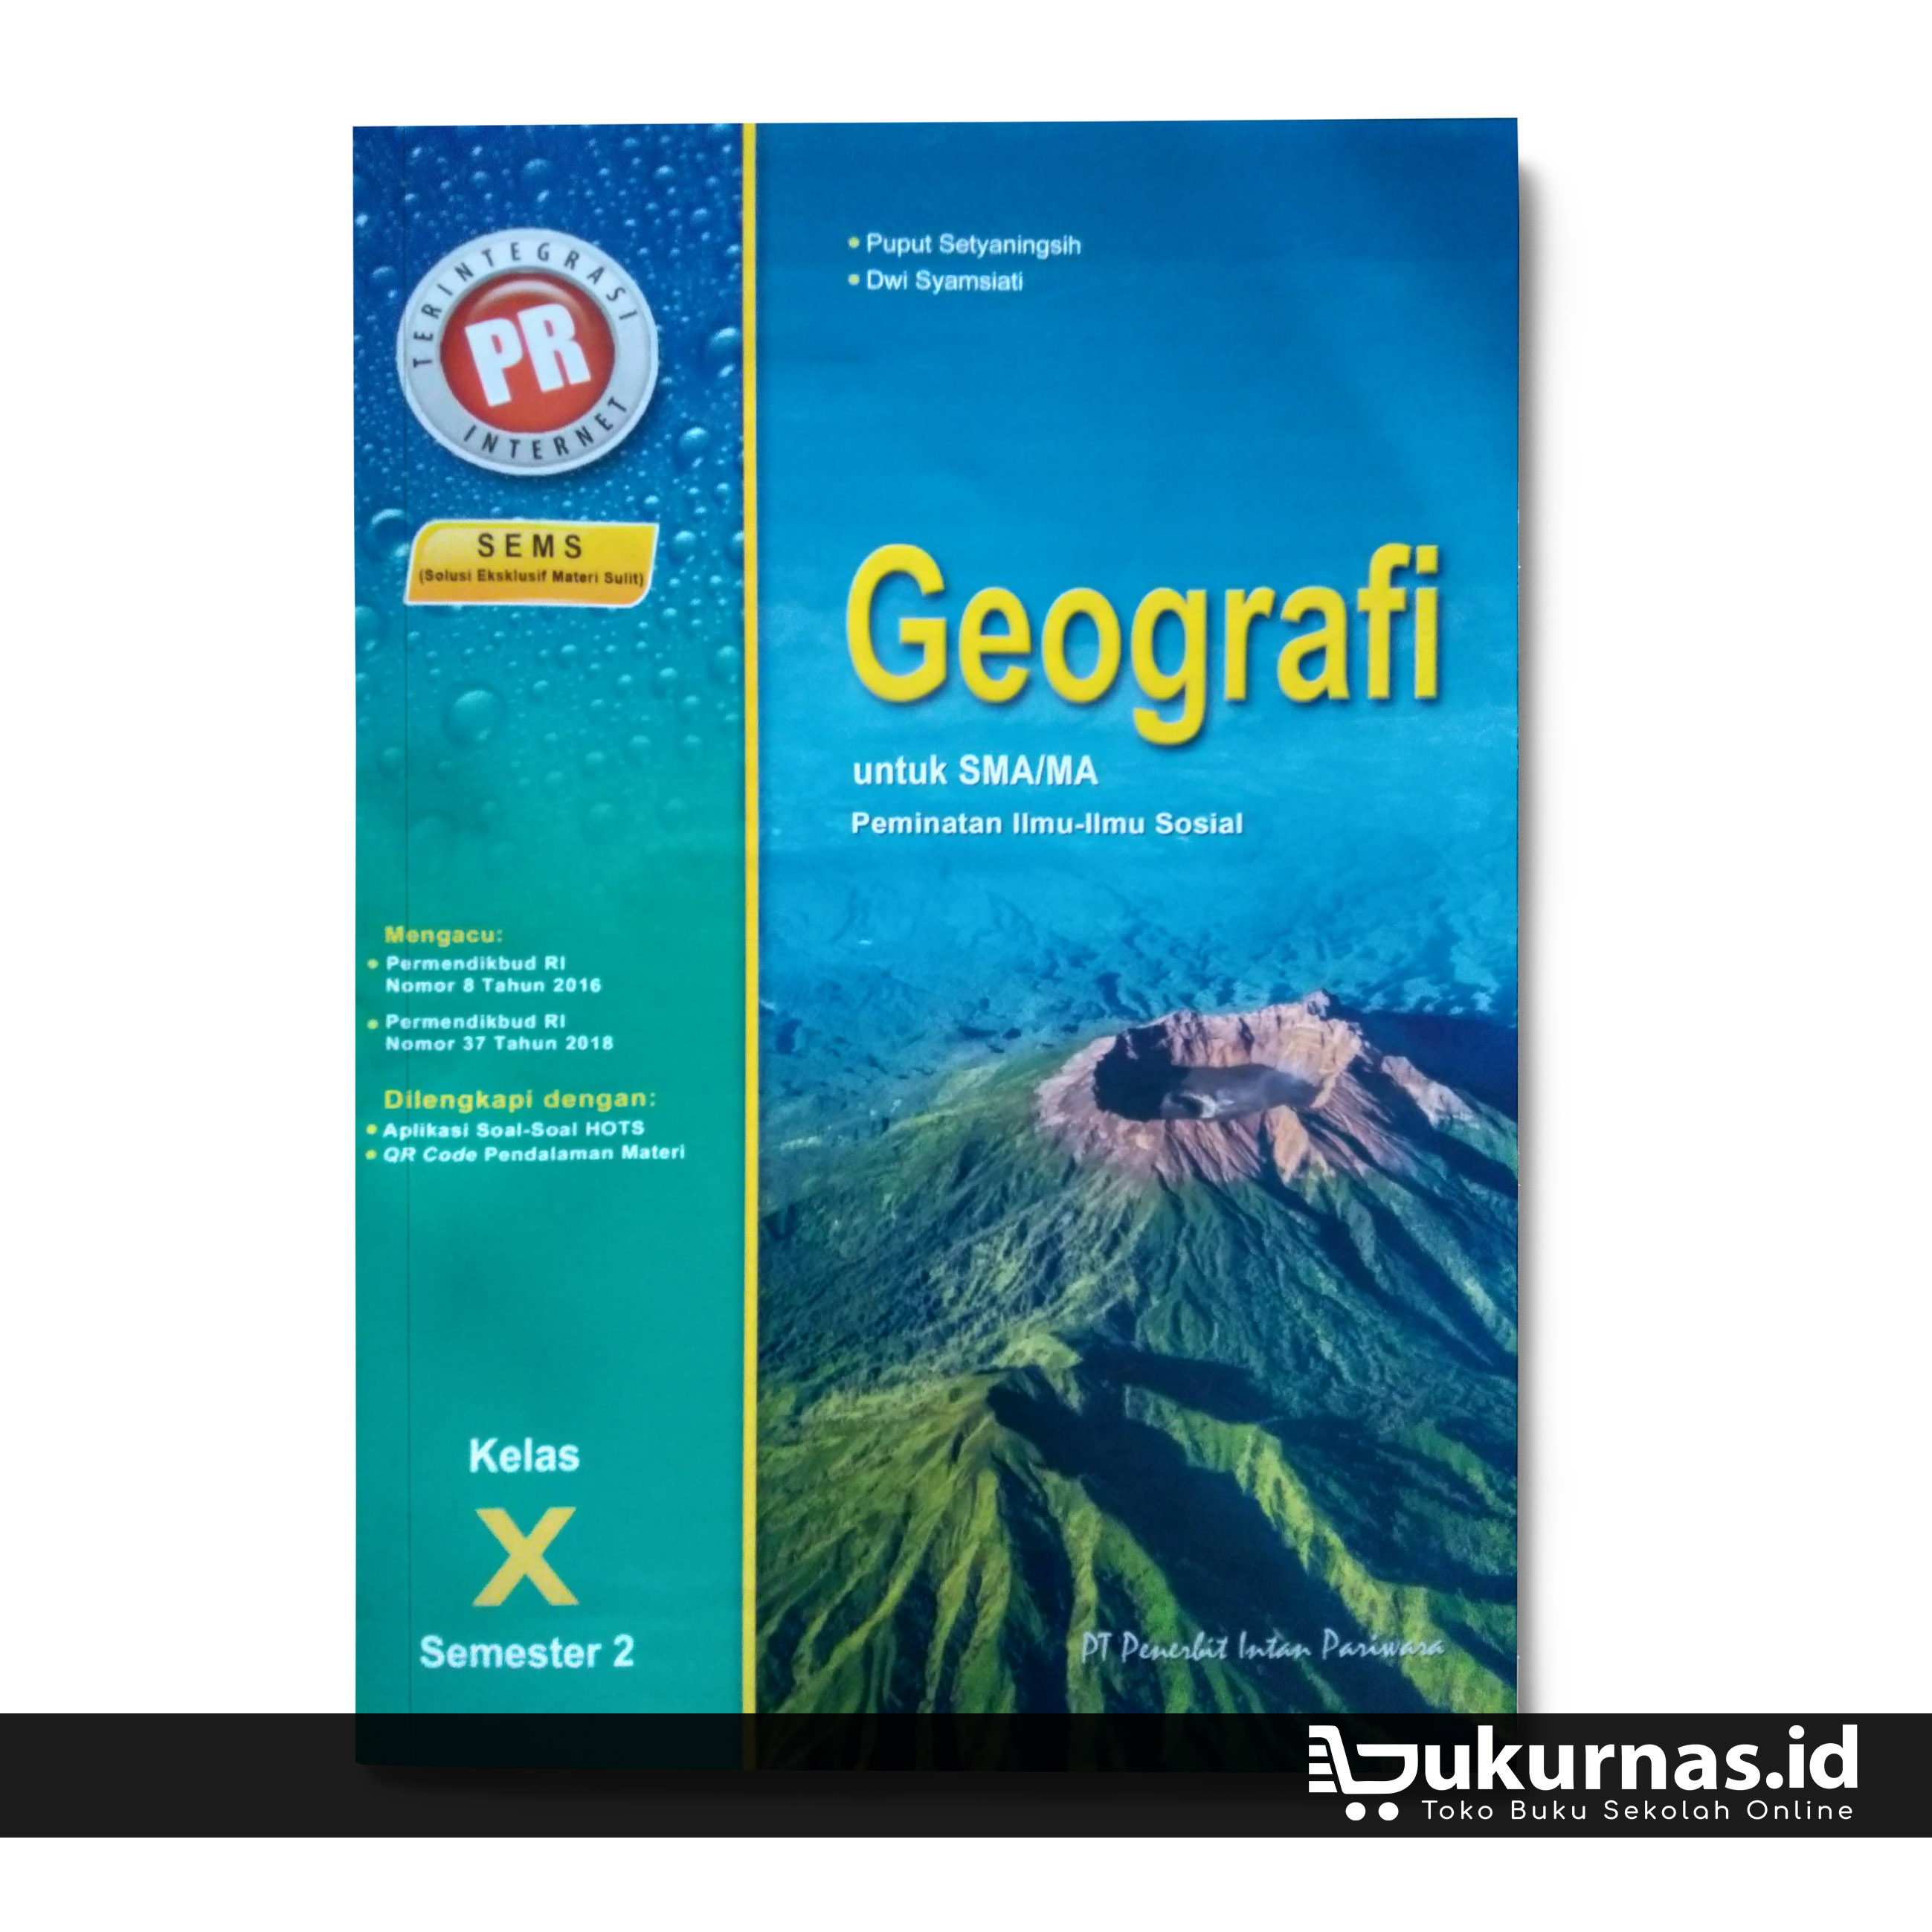 Buku Lks Geografi Kelas 10 Semester 2 Peminatan K13 Intan Pariwara Lazada Indonesia